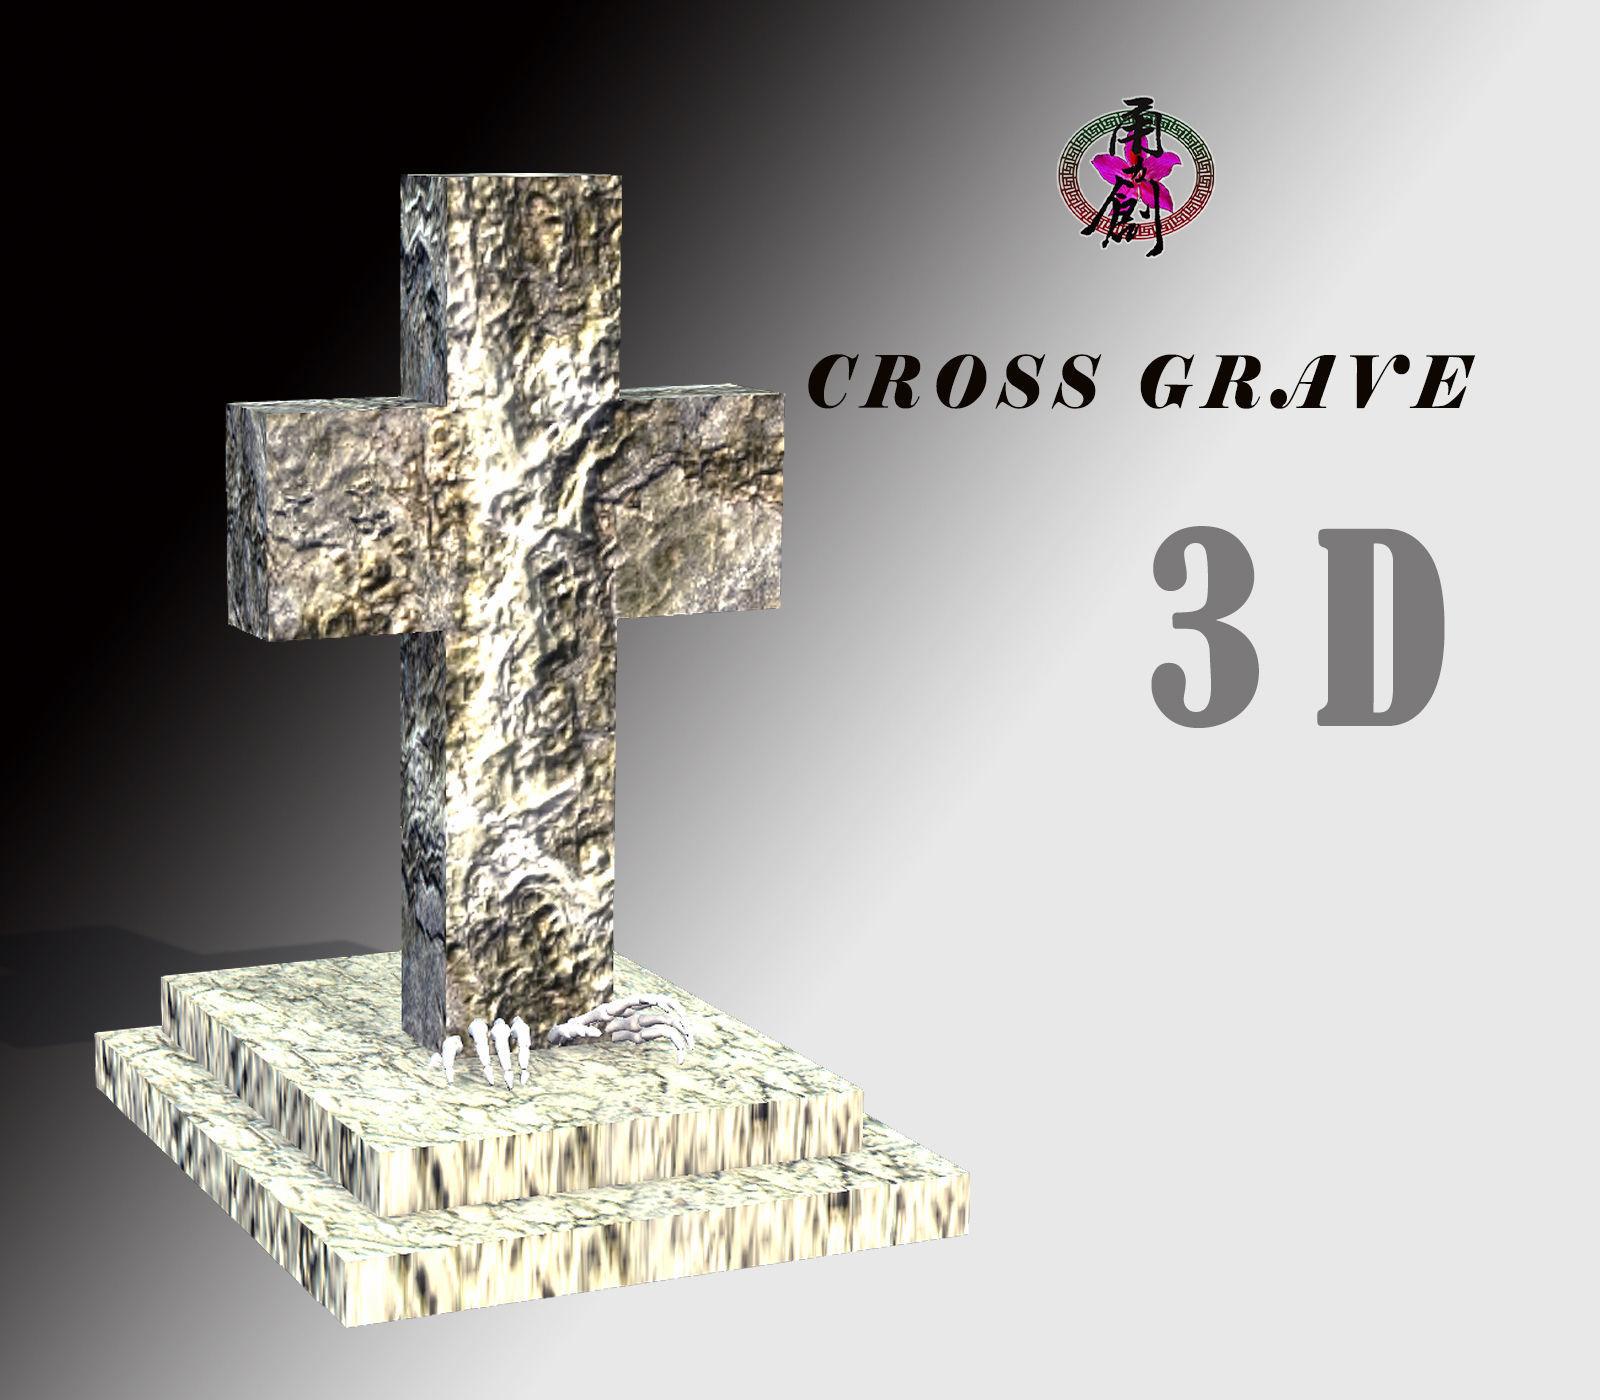 Cross Grave